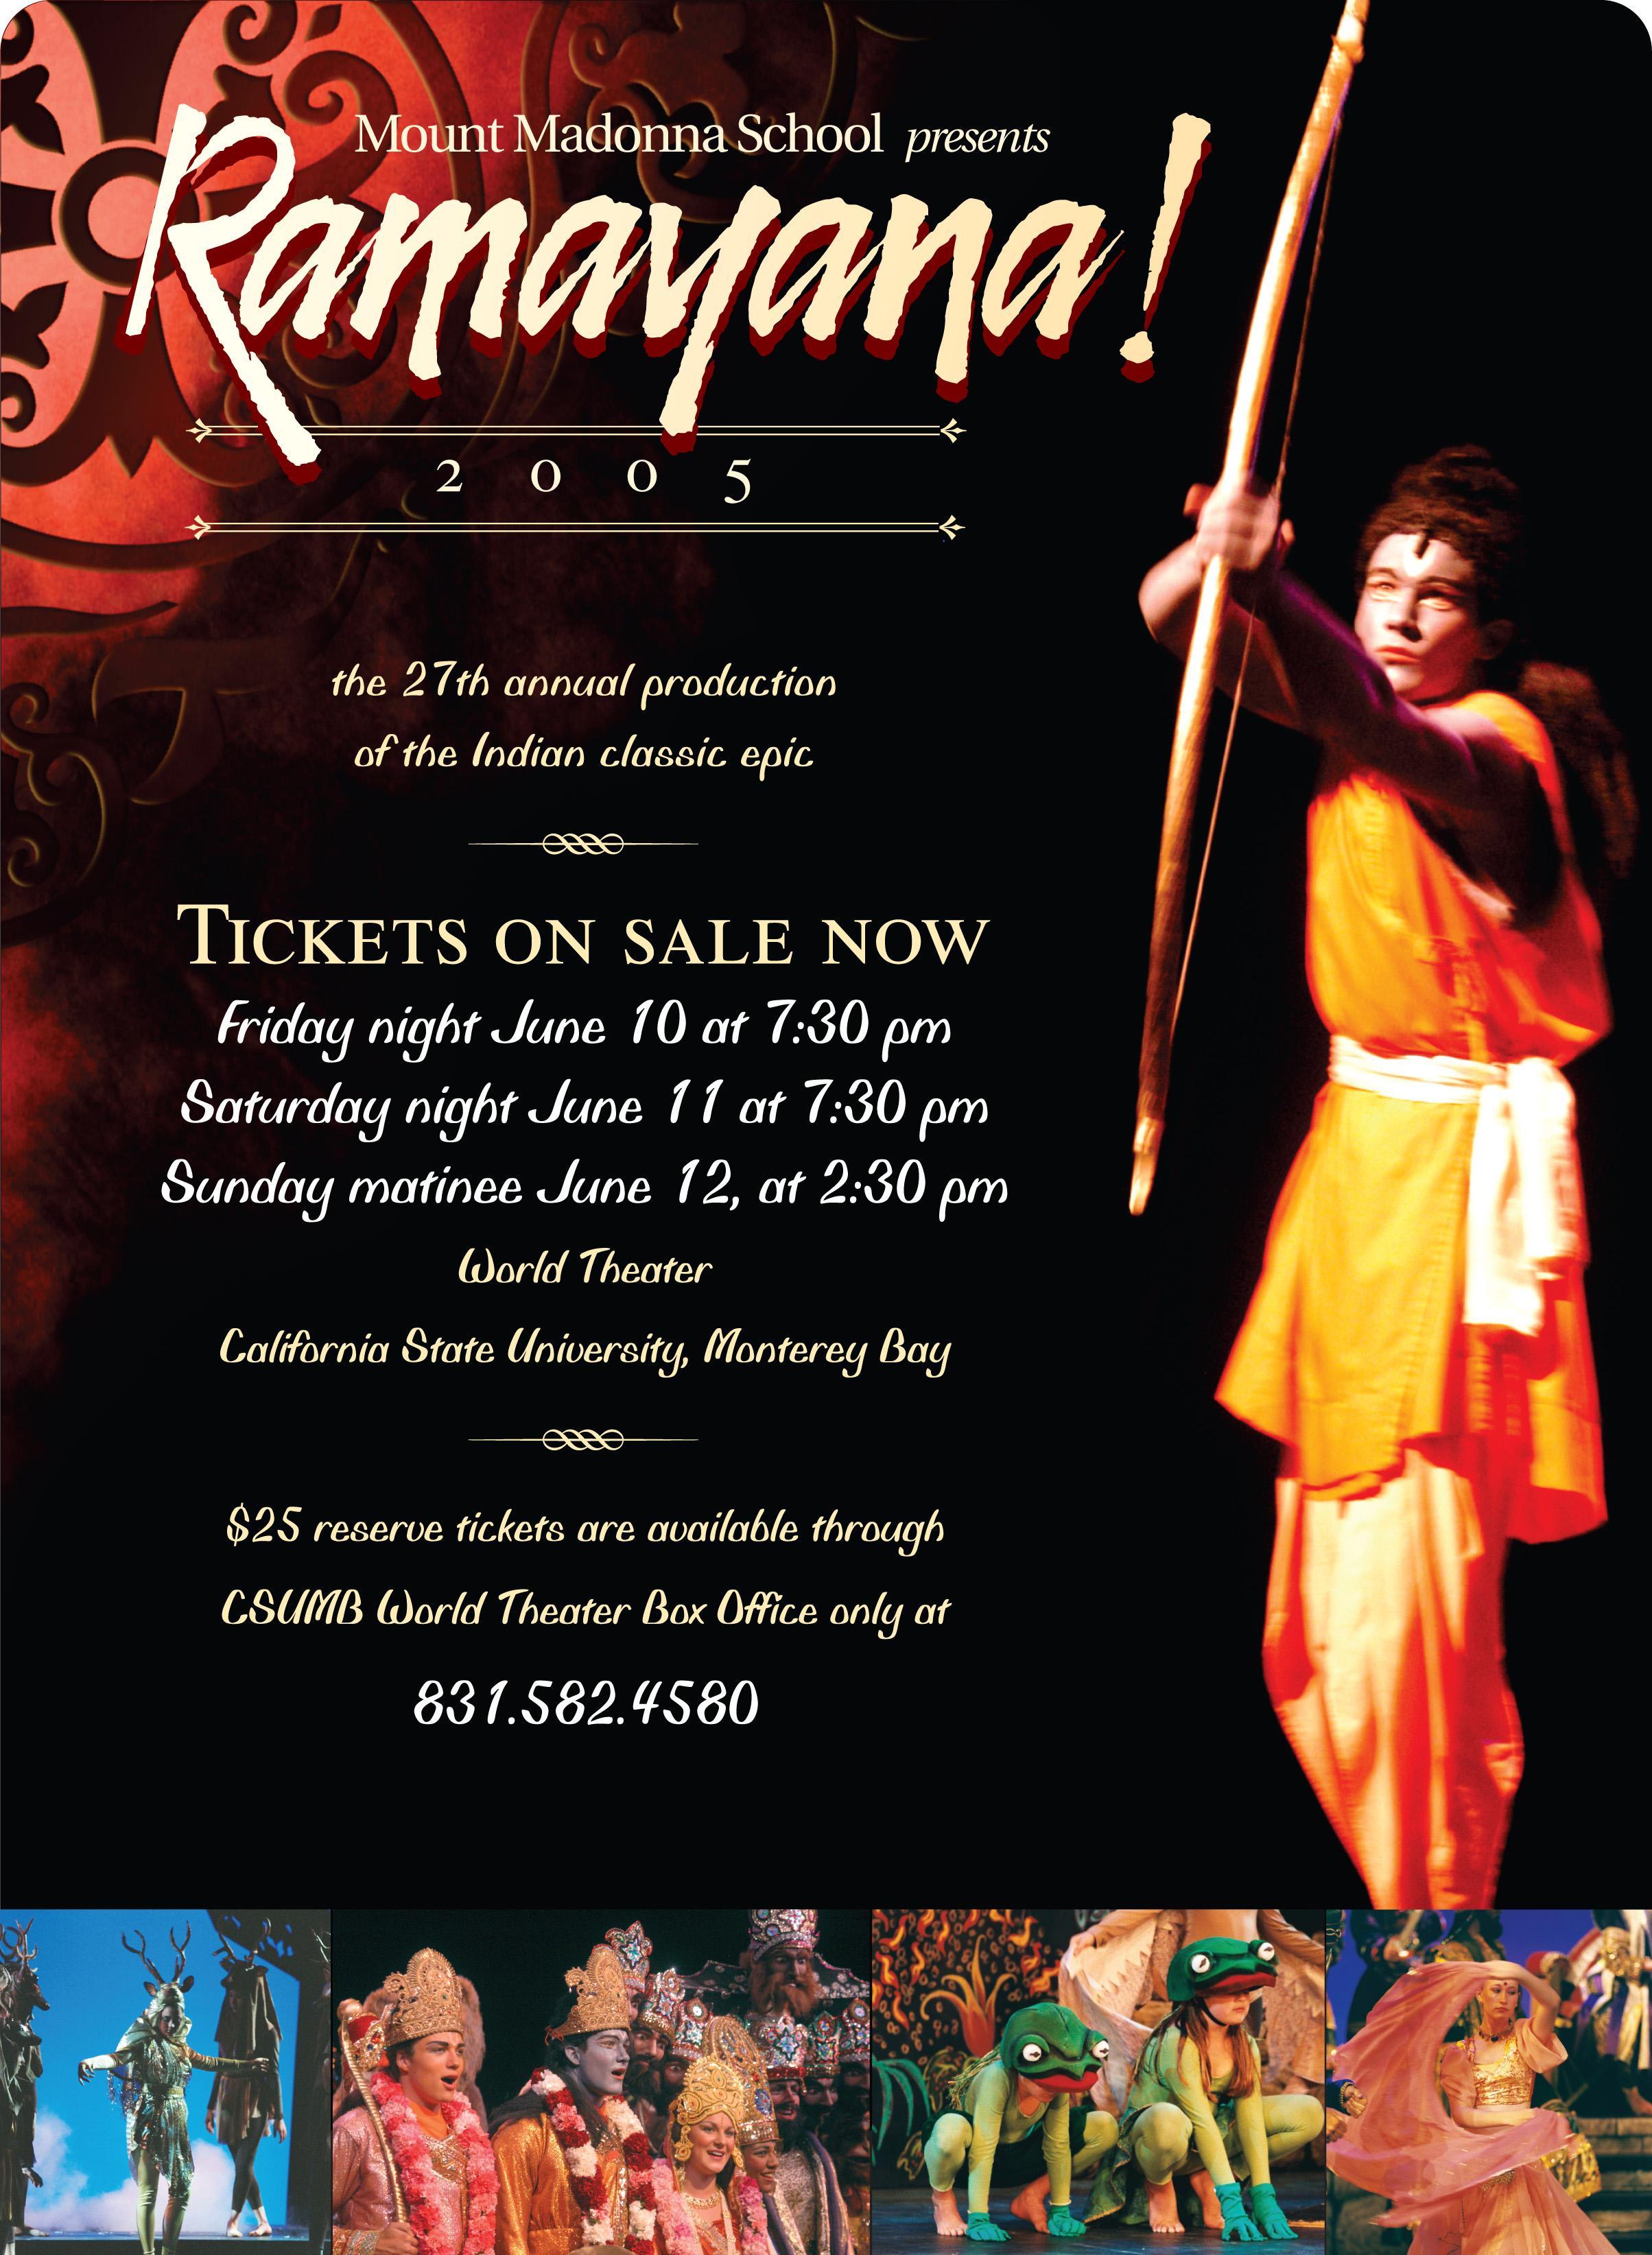 2005 <i>Ramayana!</i> DVD